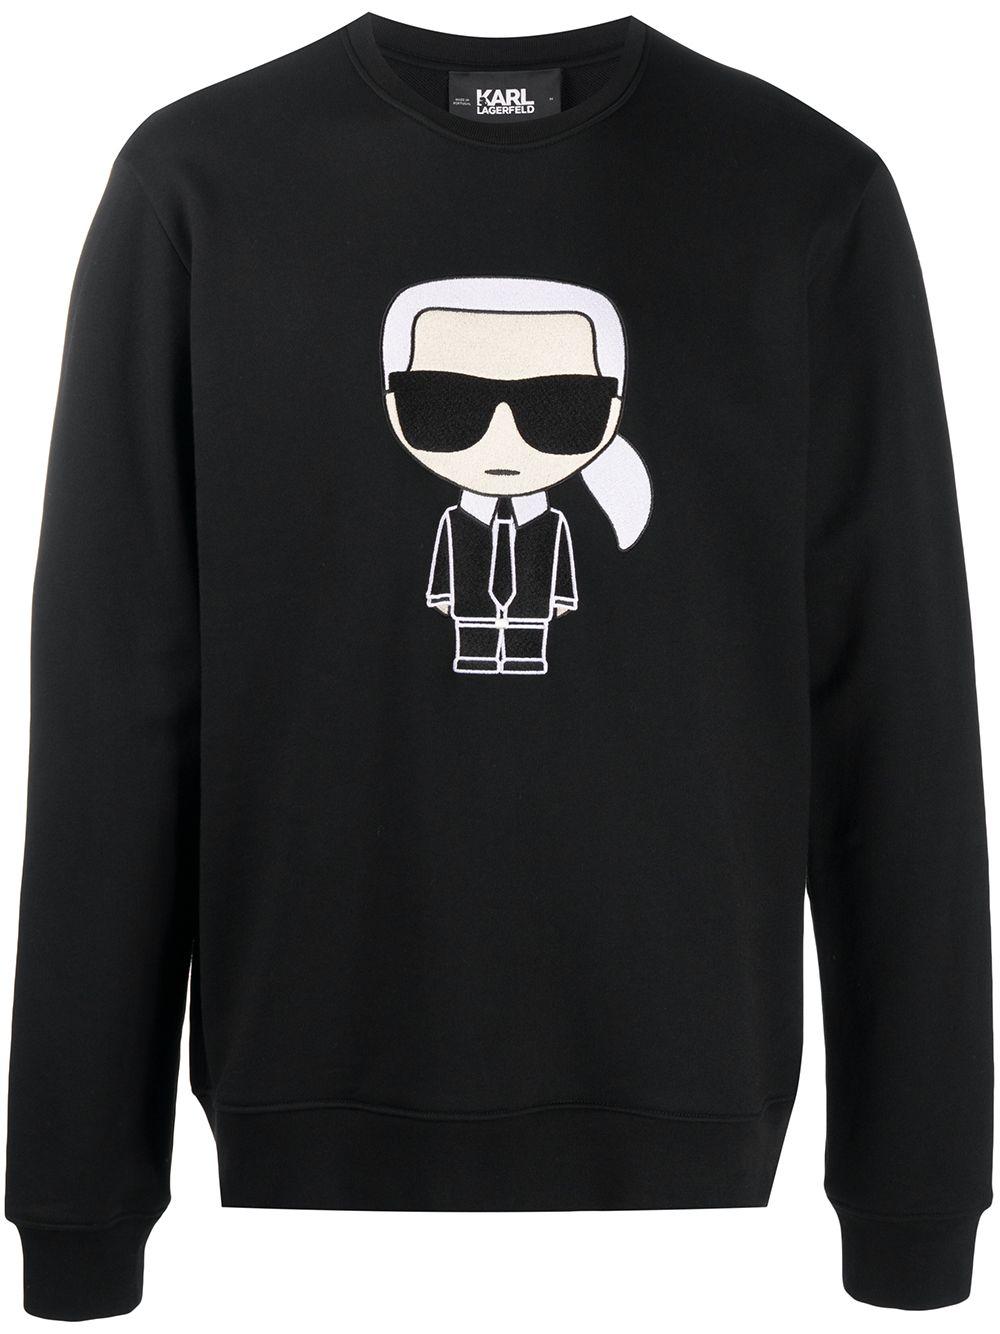 Karl Lagerfeld 'Ikonik' Sweatshirt - Schwarz